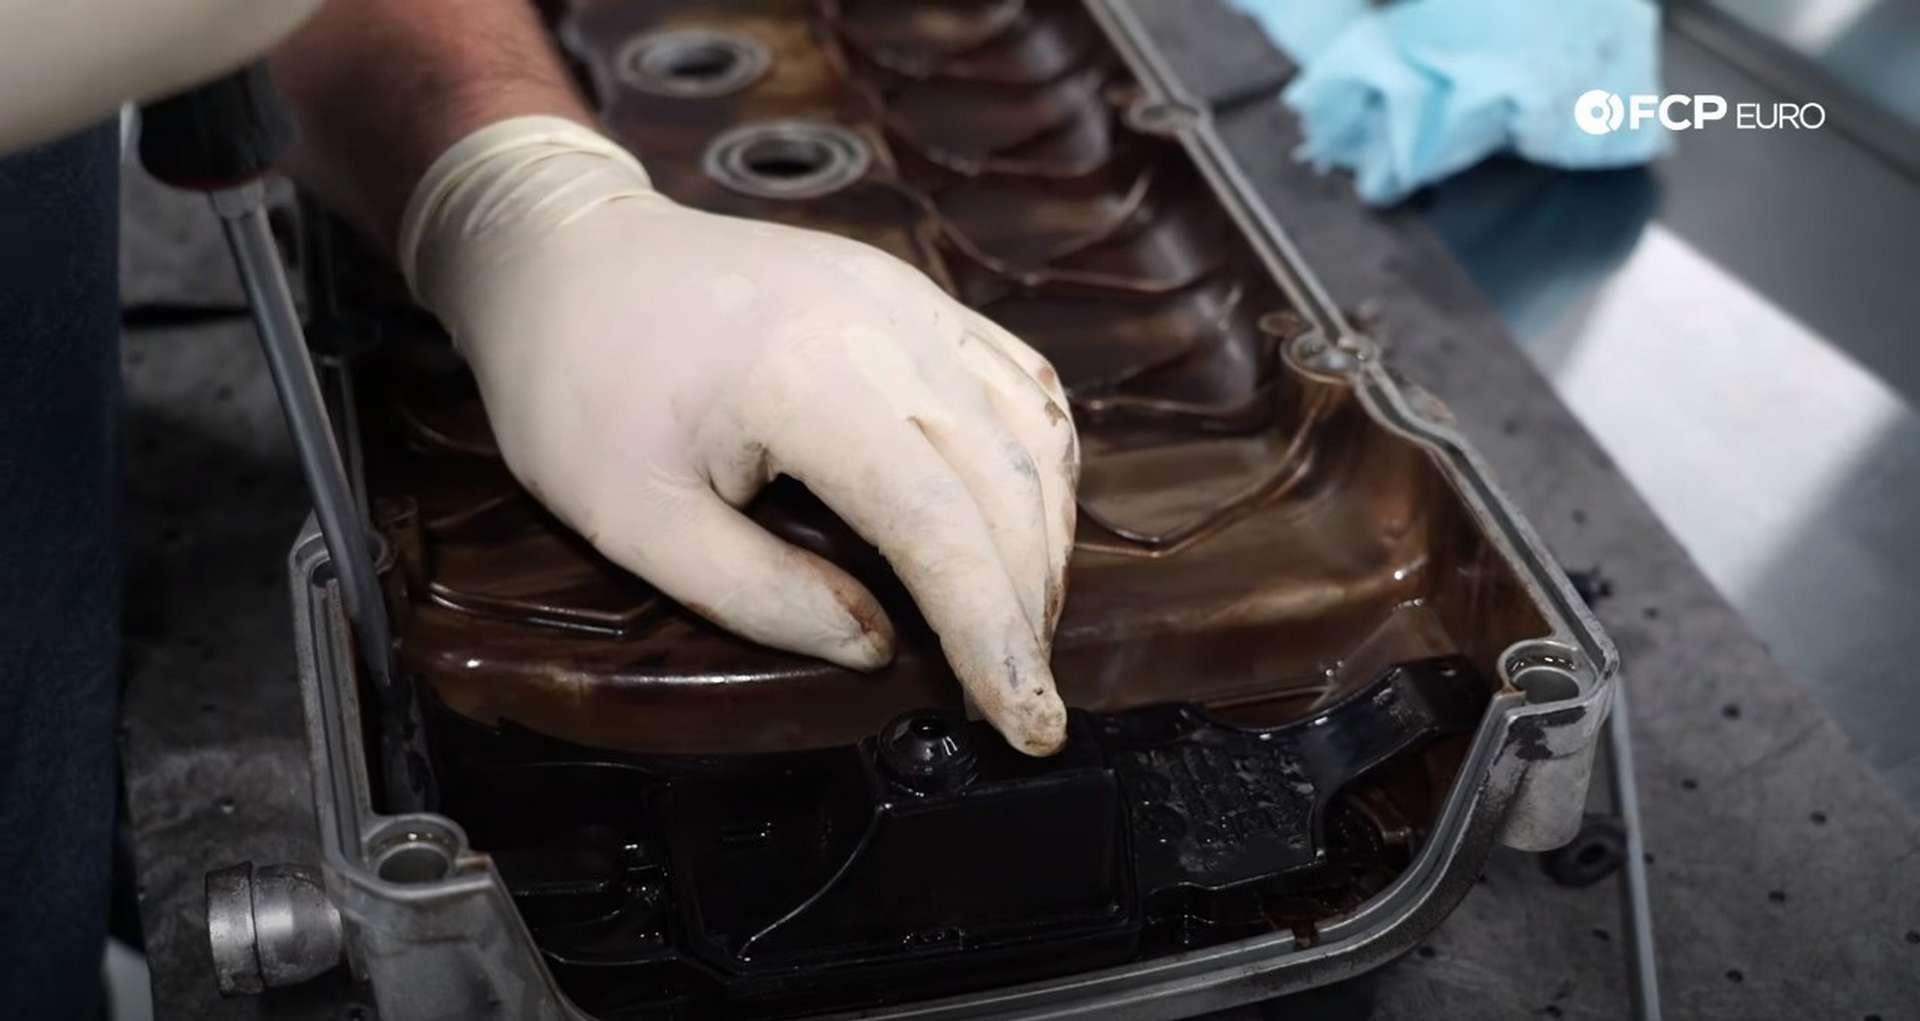 42-DIY-VW-VR6-Valve-Cover-Gasket-Replacing-Gasket